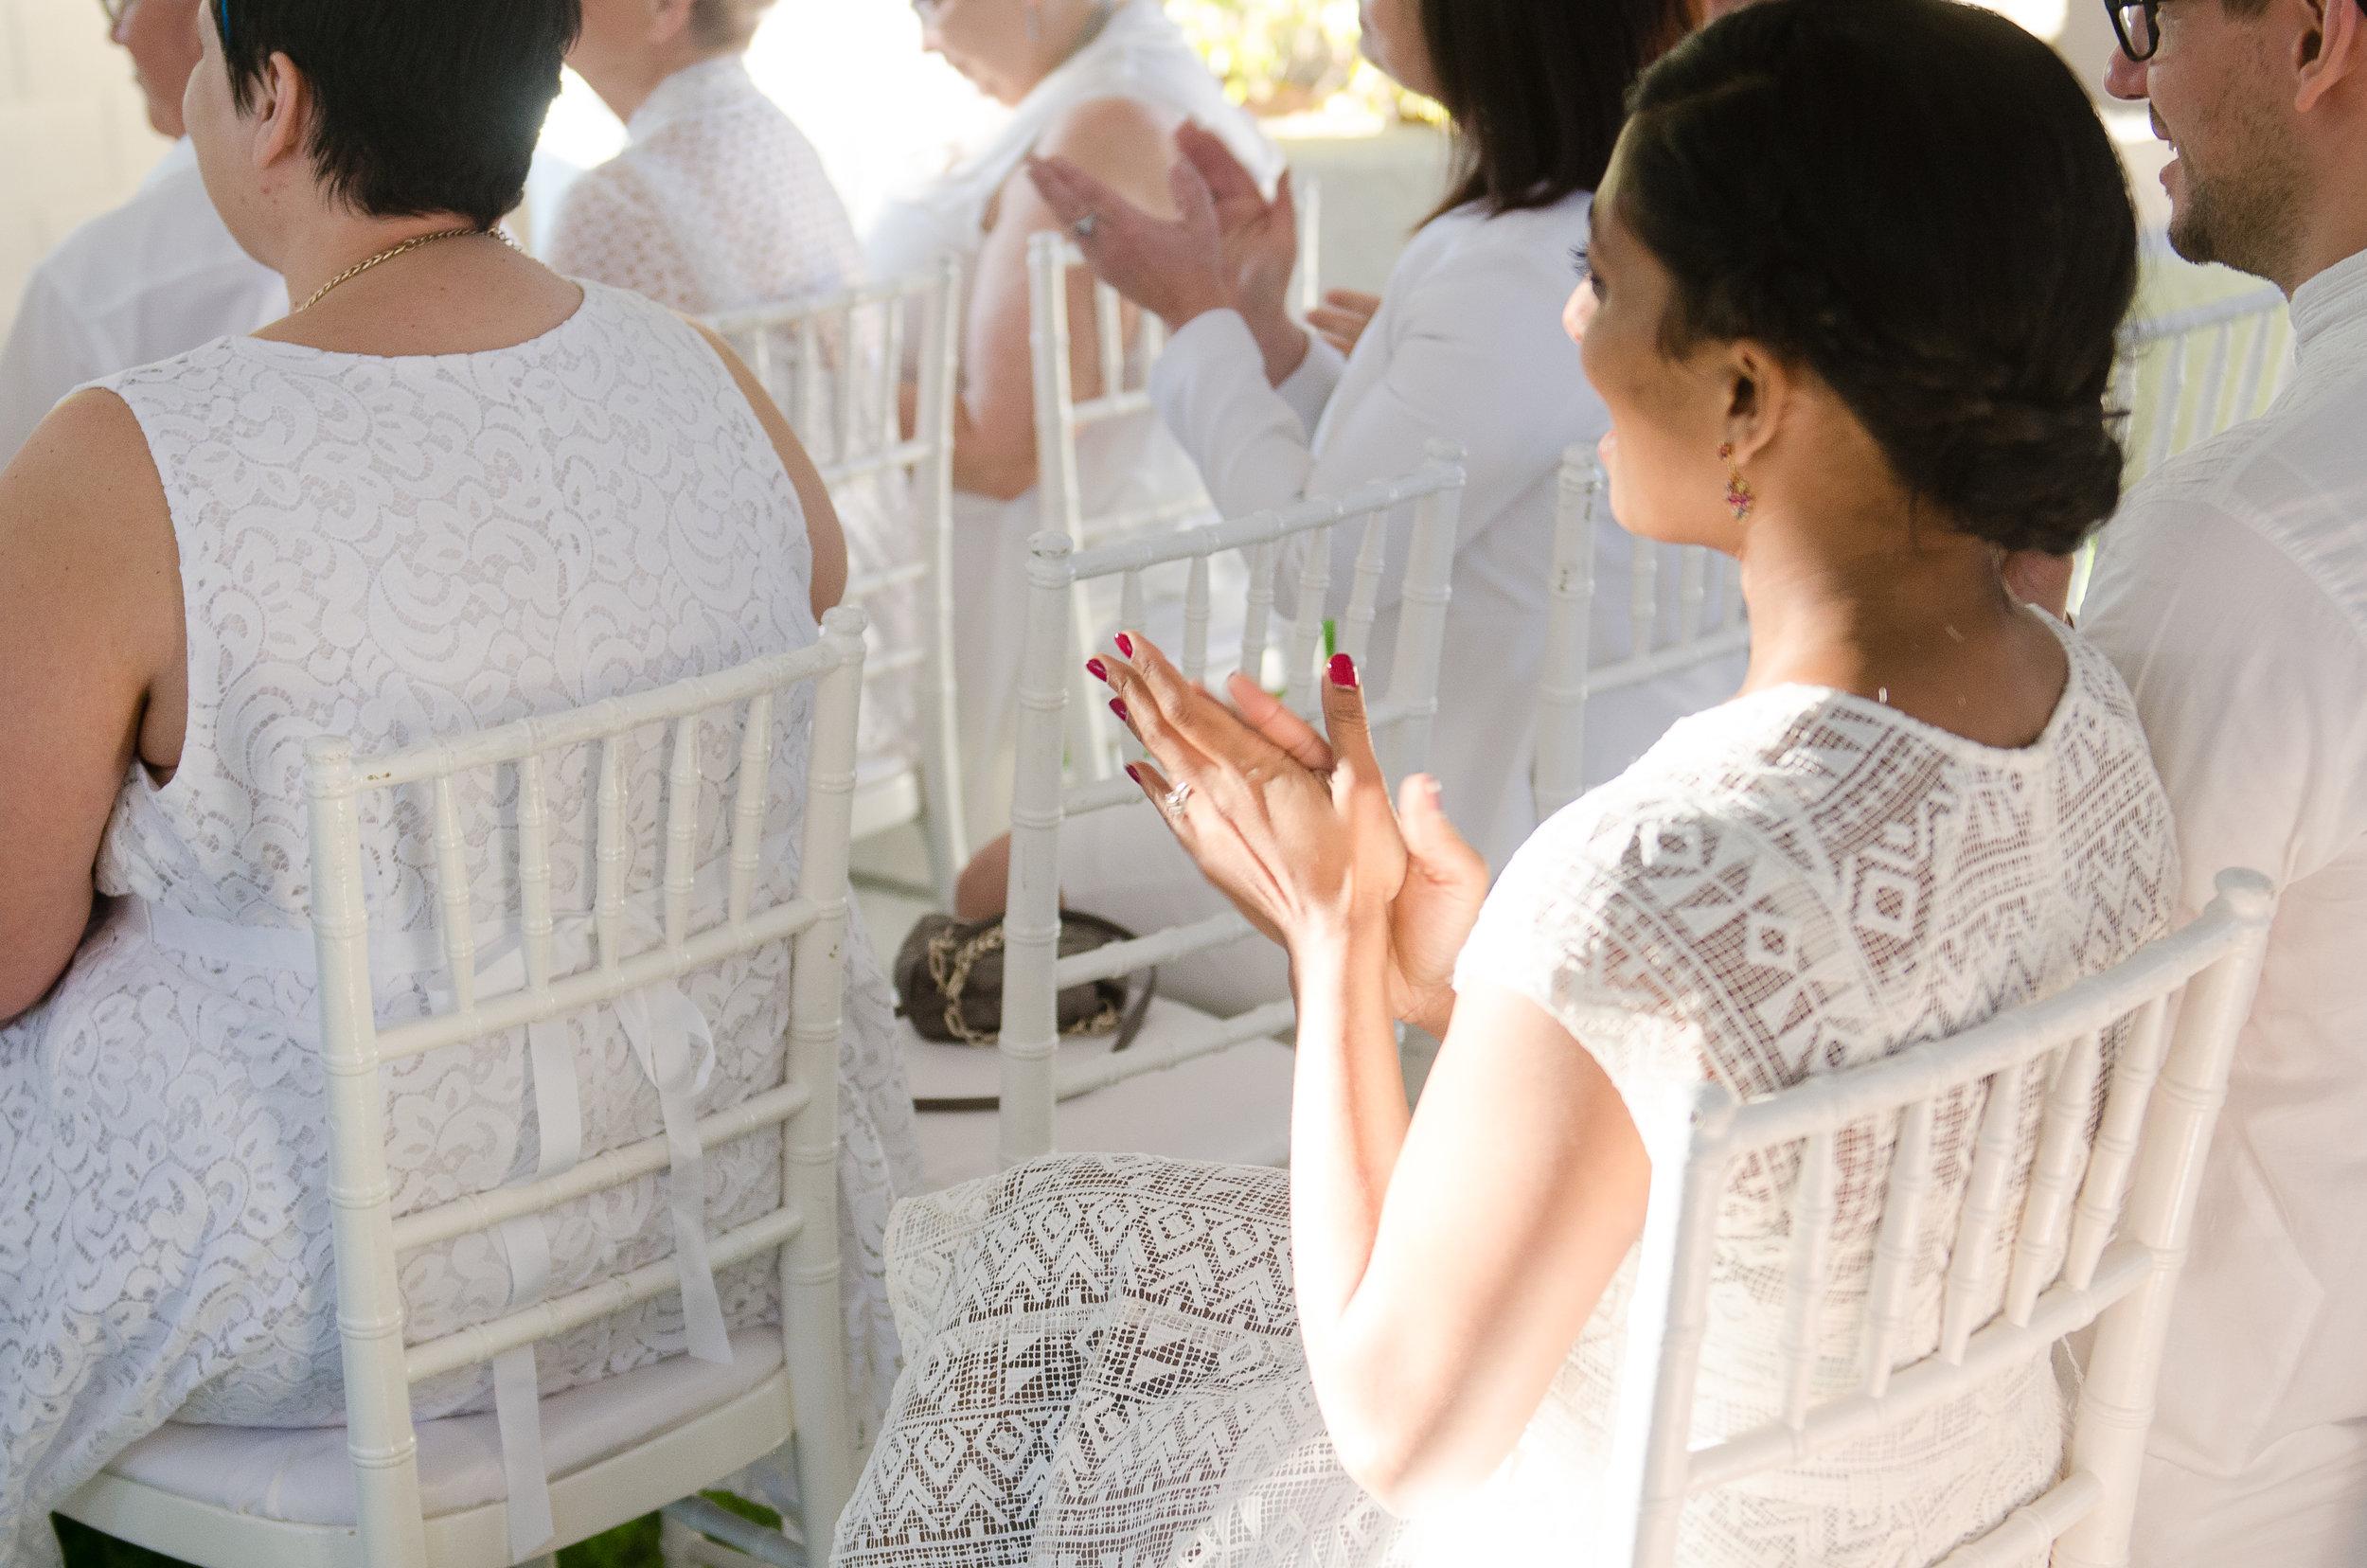 Photos of Robert and Talal's wedding by Bradford Jones